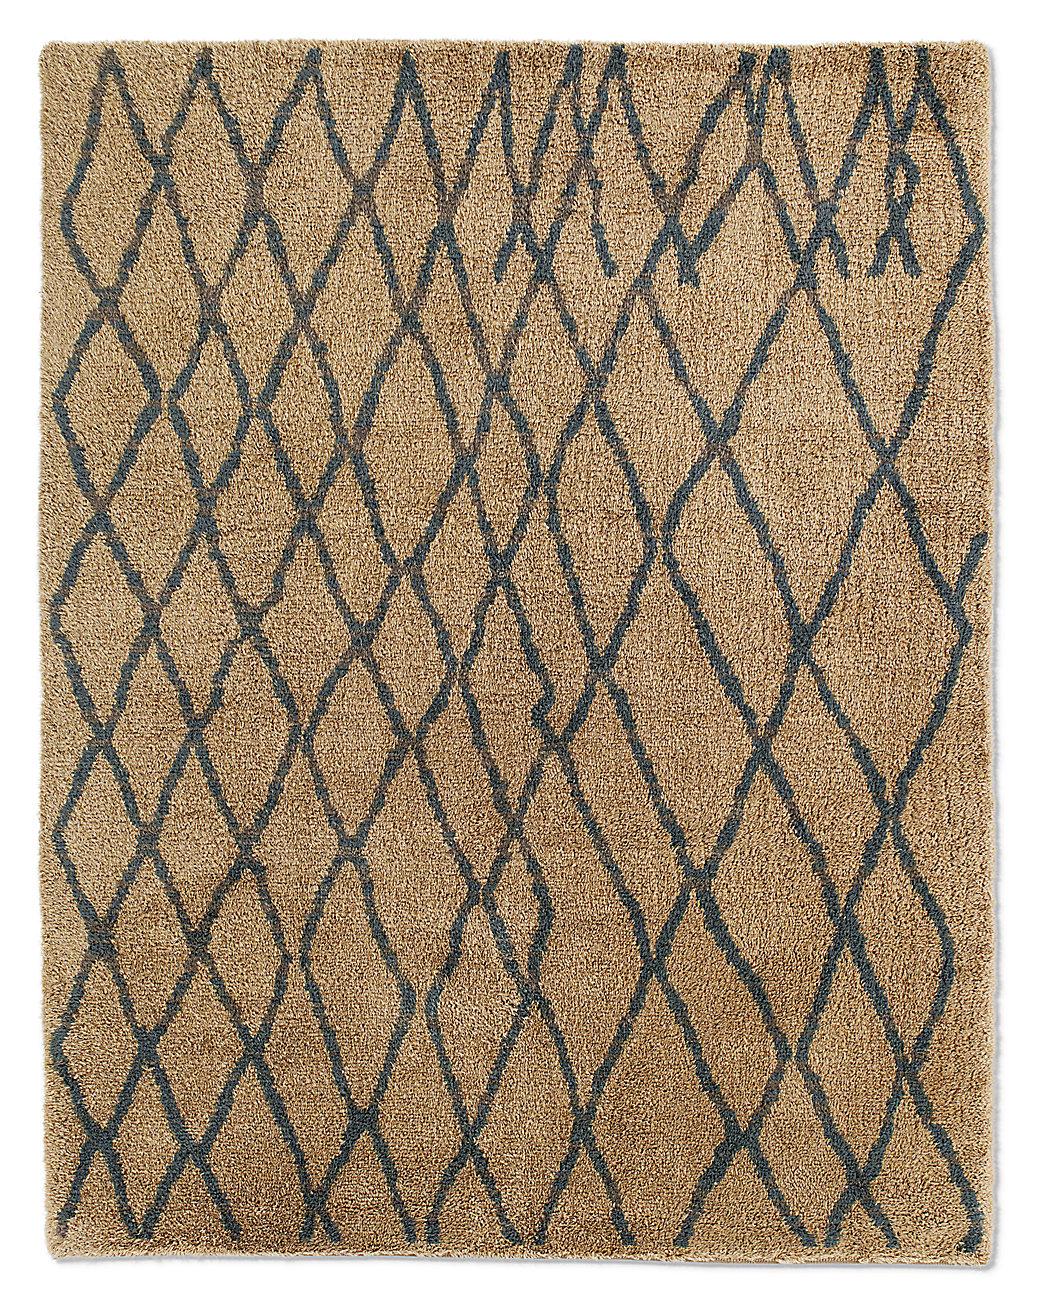 Talaa rug mocha for Restoration hardware rugs on sale